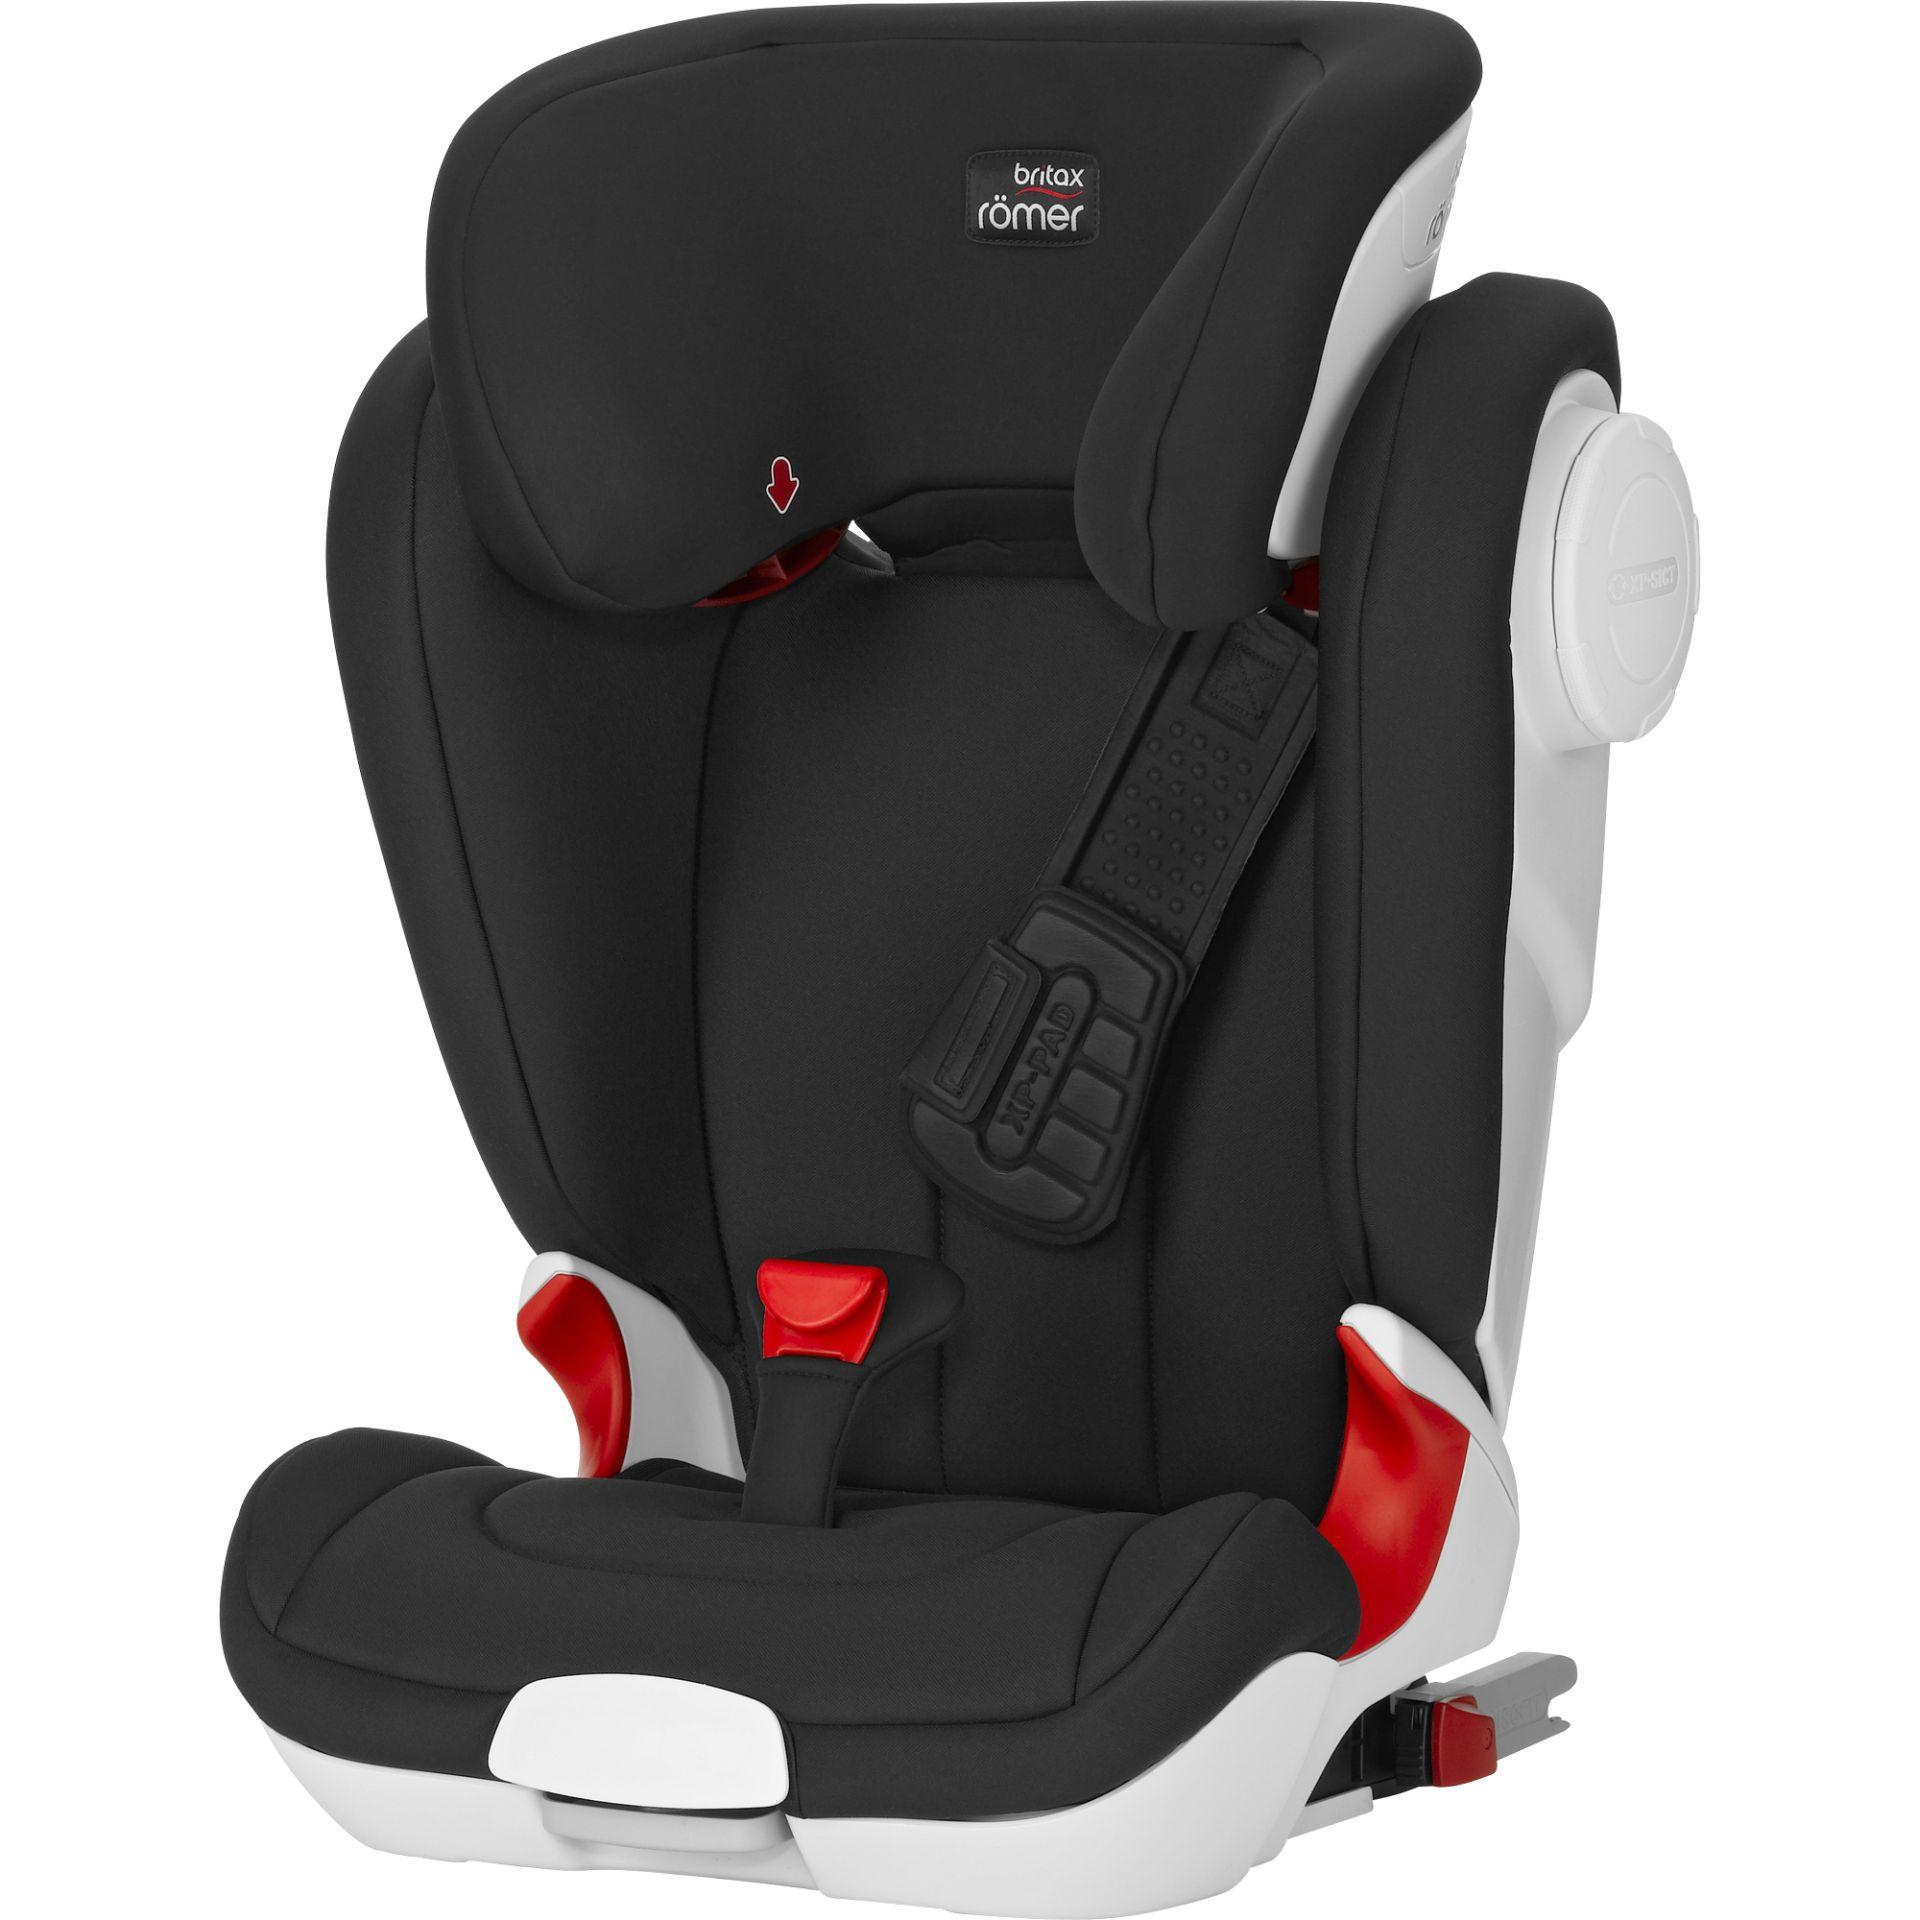 britax r mer child car seat kidfix ii xp sict 2018 cosmos black buy at kidsroom car seats. Black Bedroom Furniture Sets. Home Design Ideas